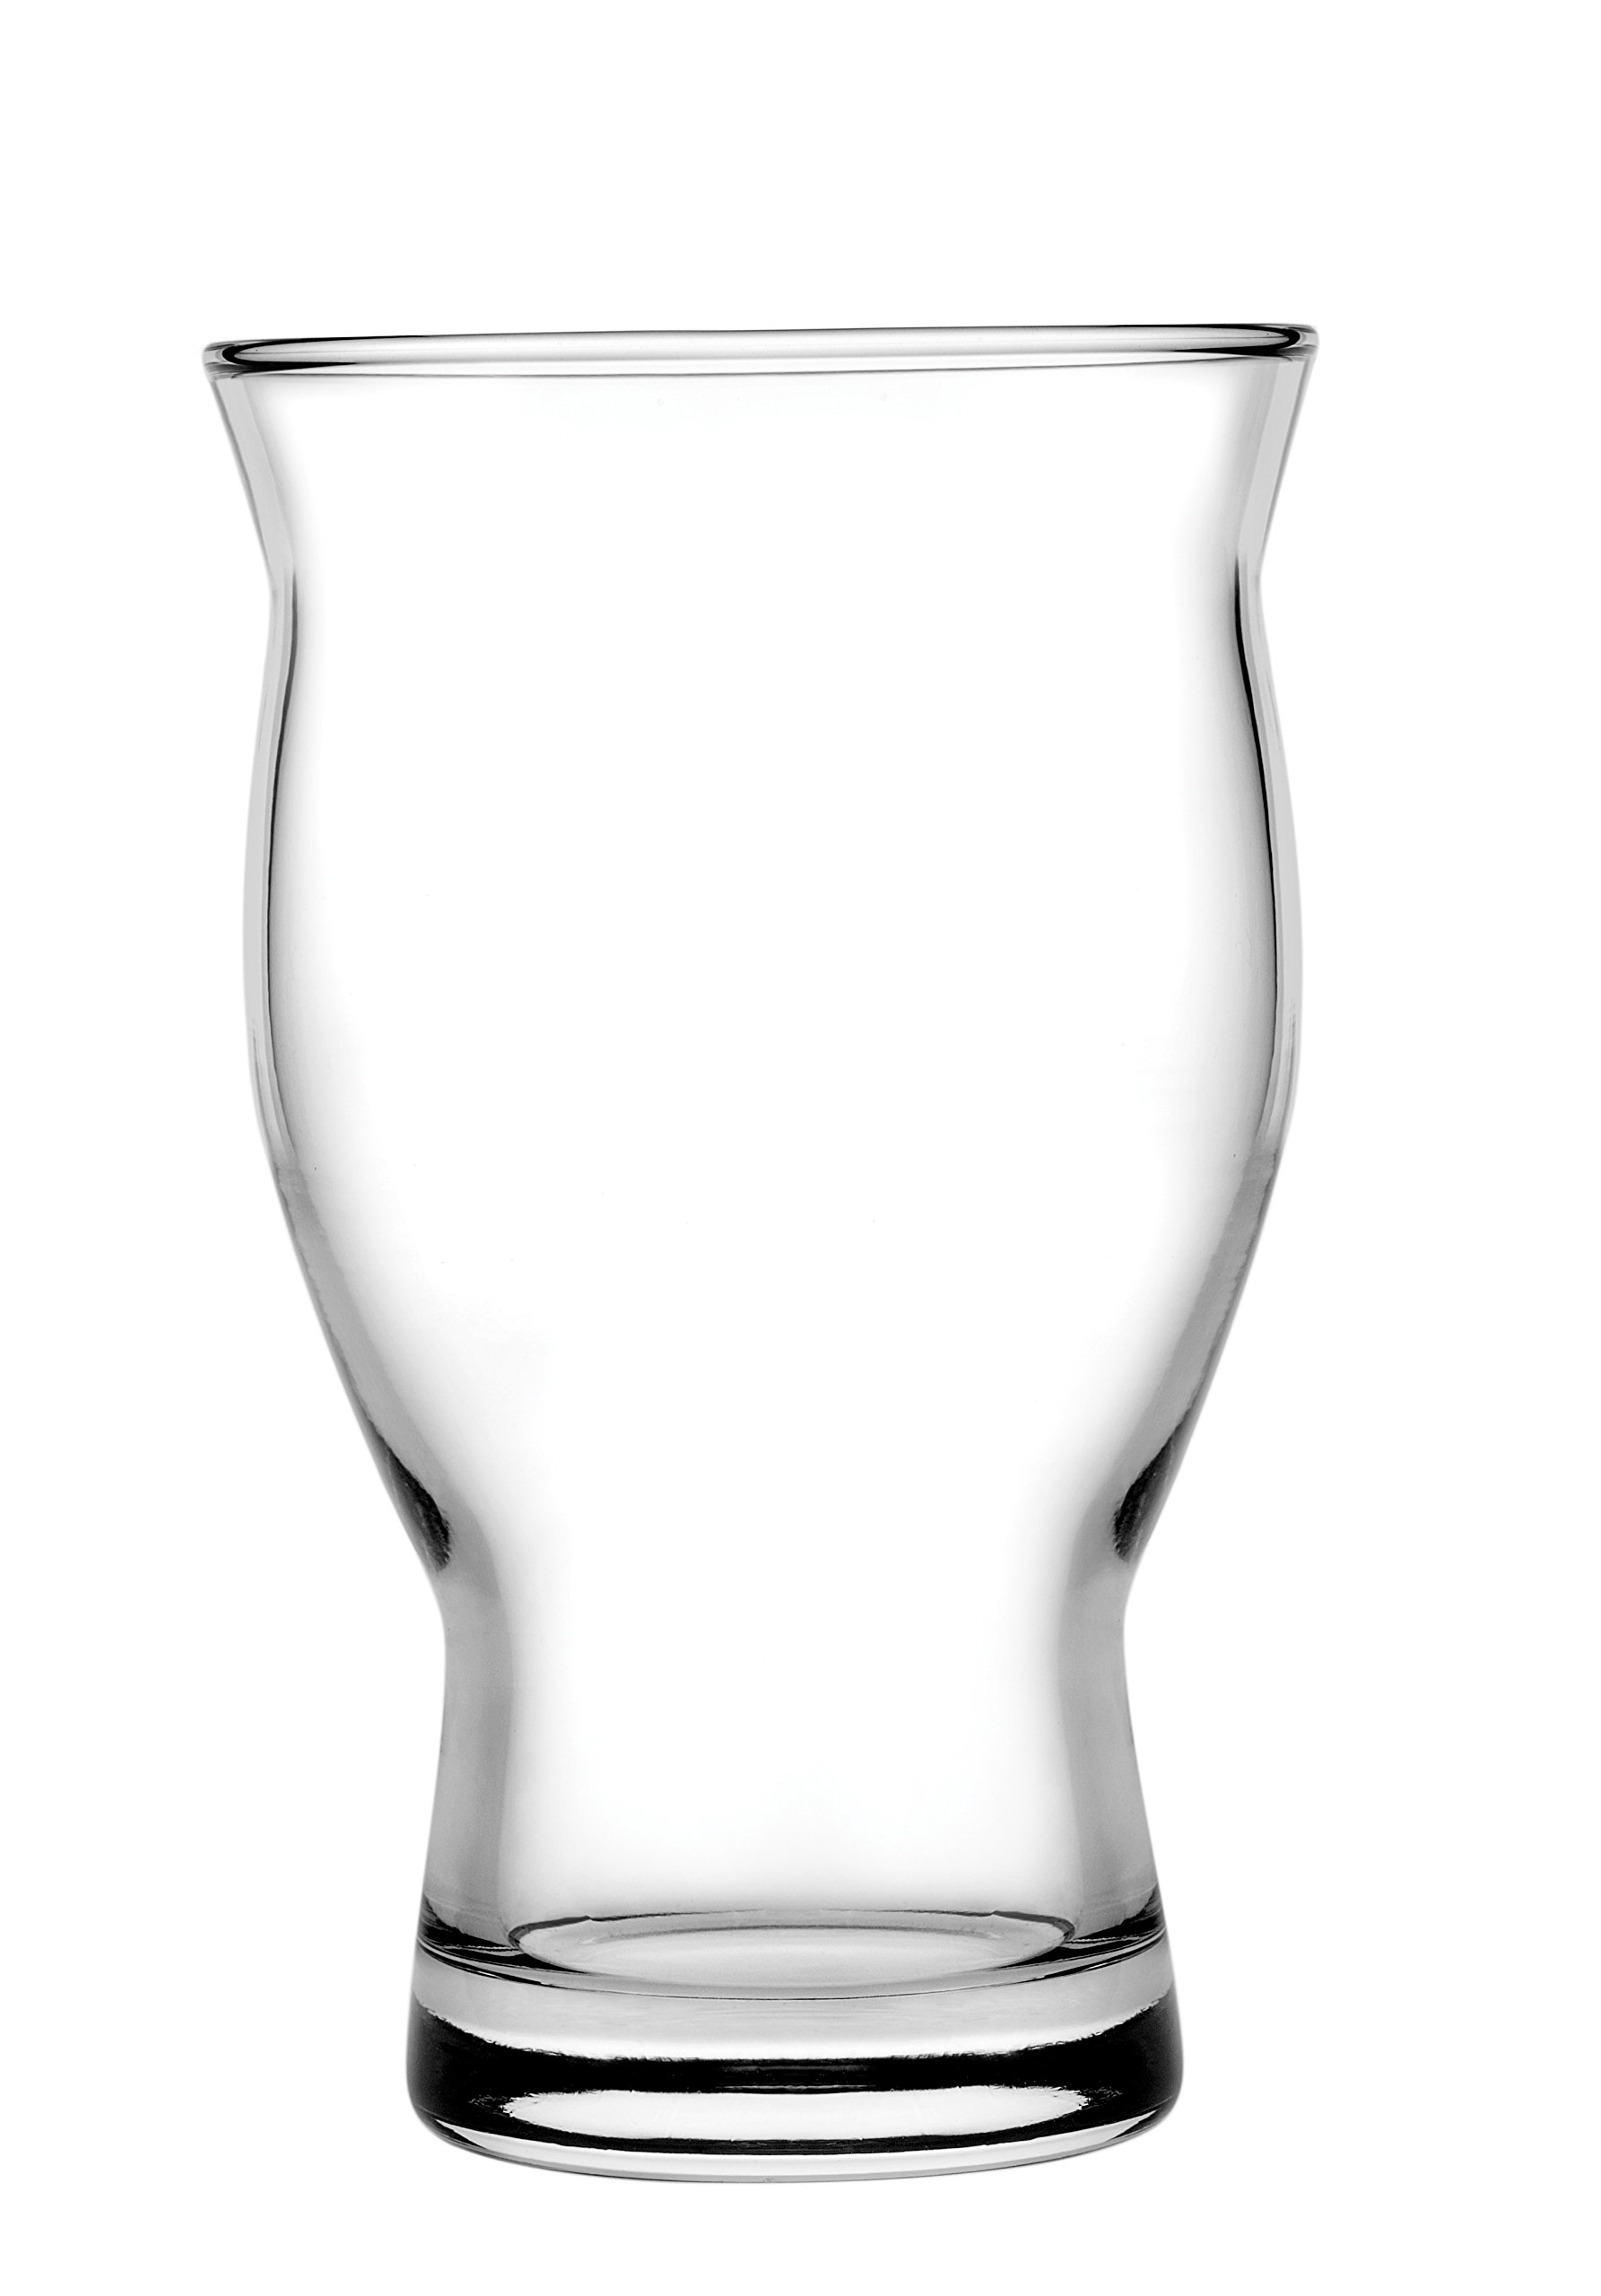 Hospitality Glass Brands 420082-024 Revival 5 oz. Taster (Pack of 24) by Hospitality Brands